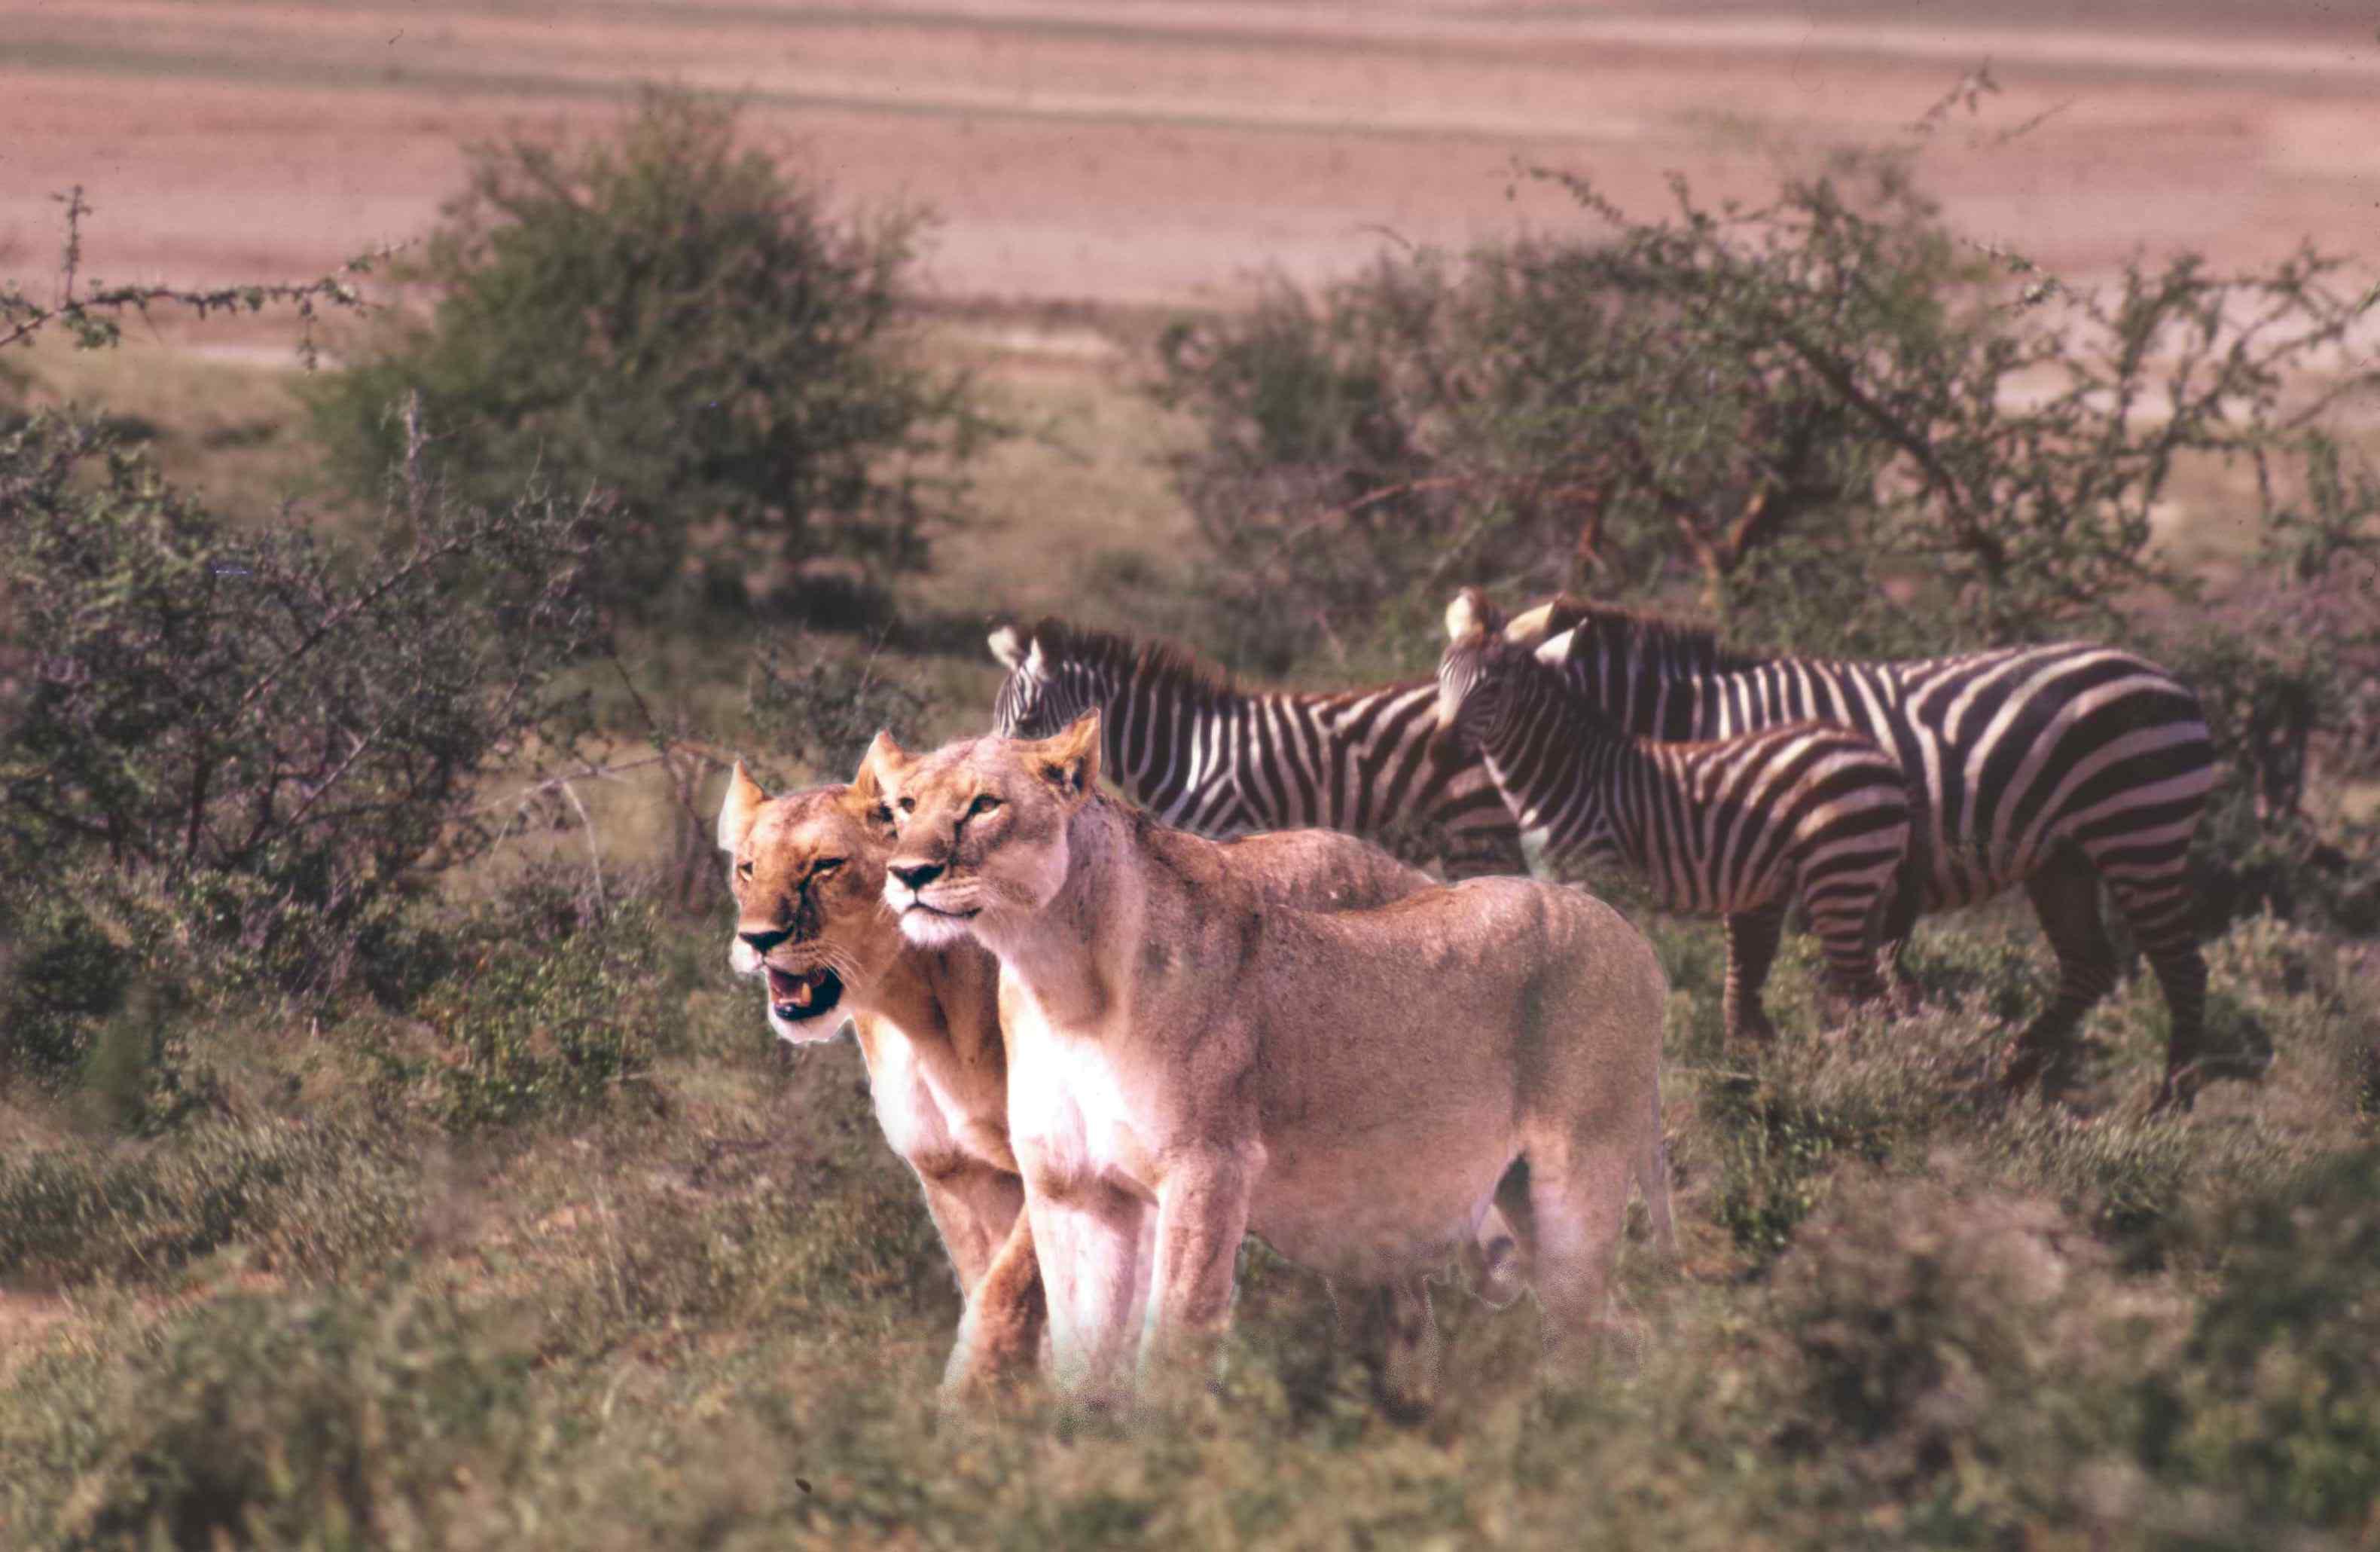 Lion Zebra Friends on Their New Lion Friends